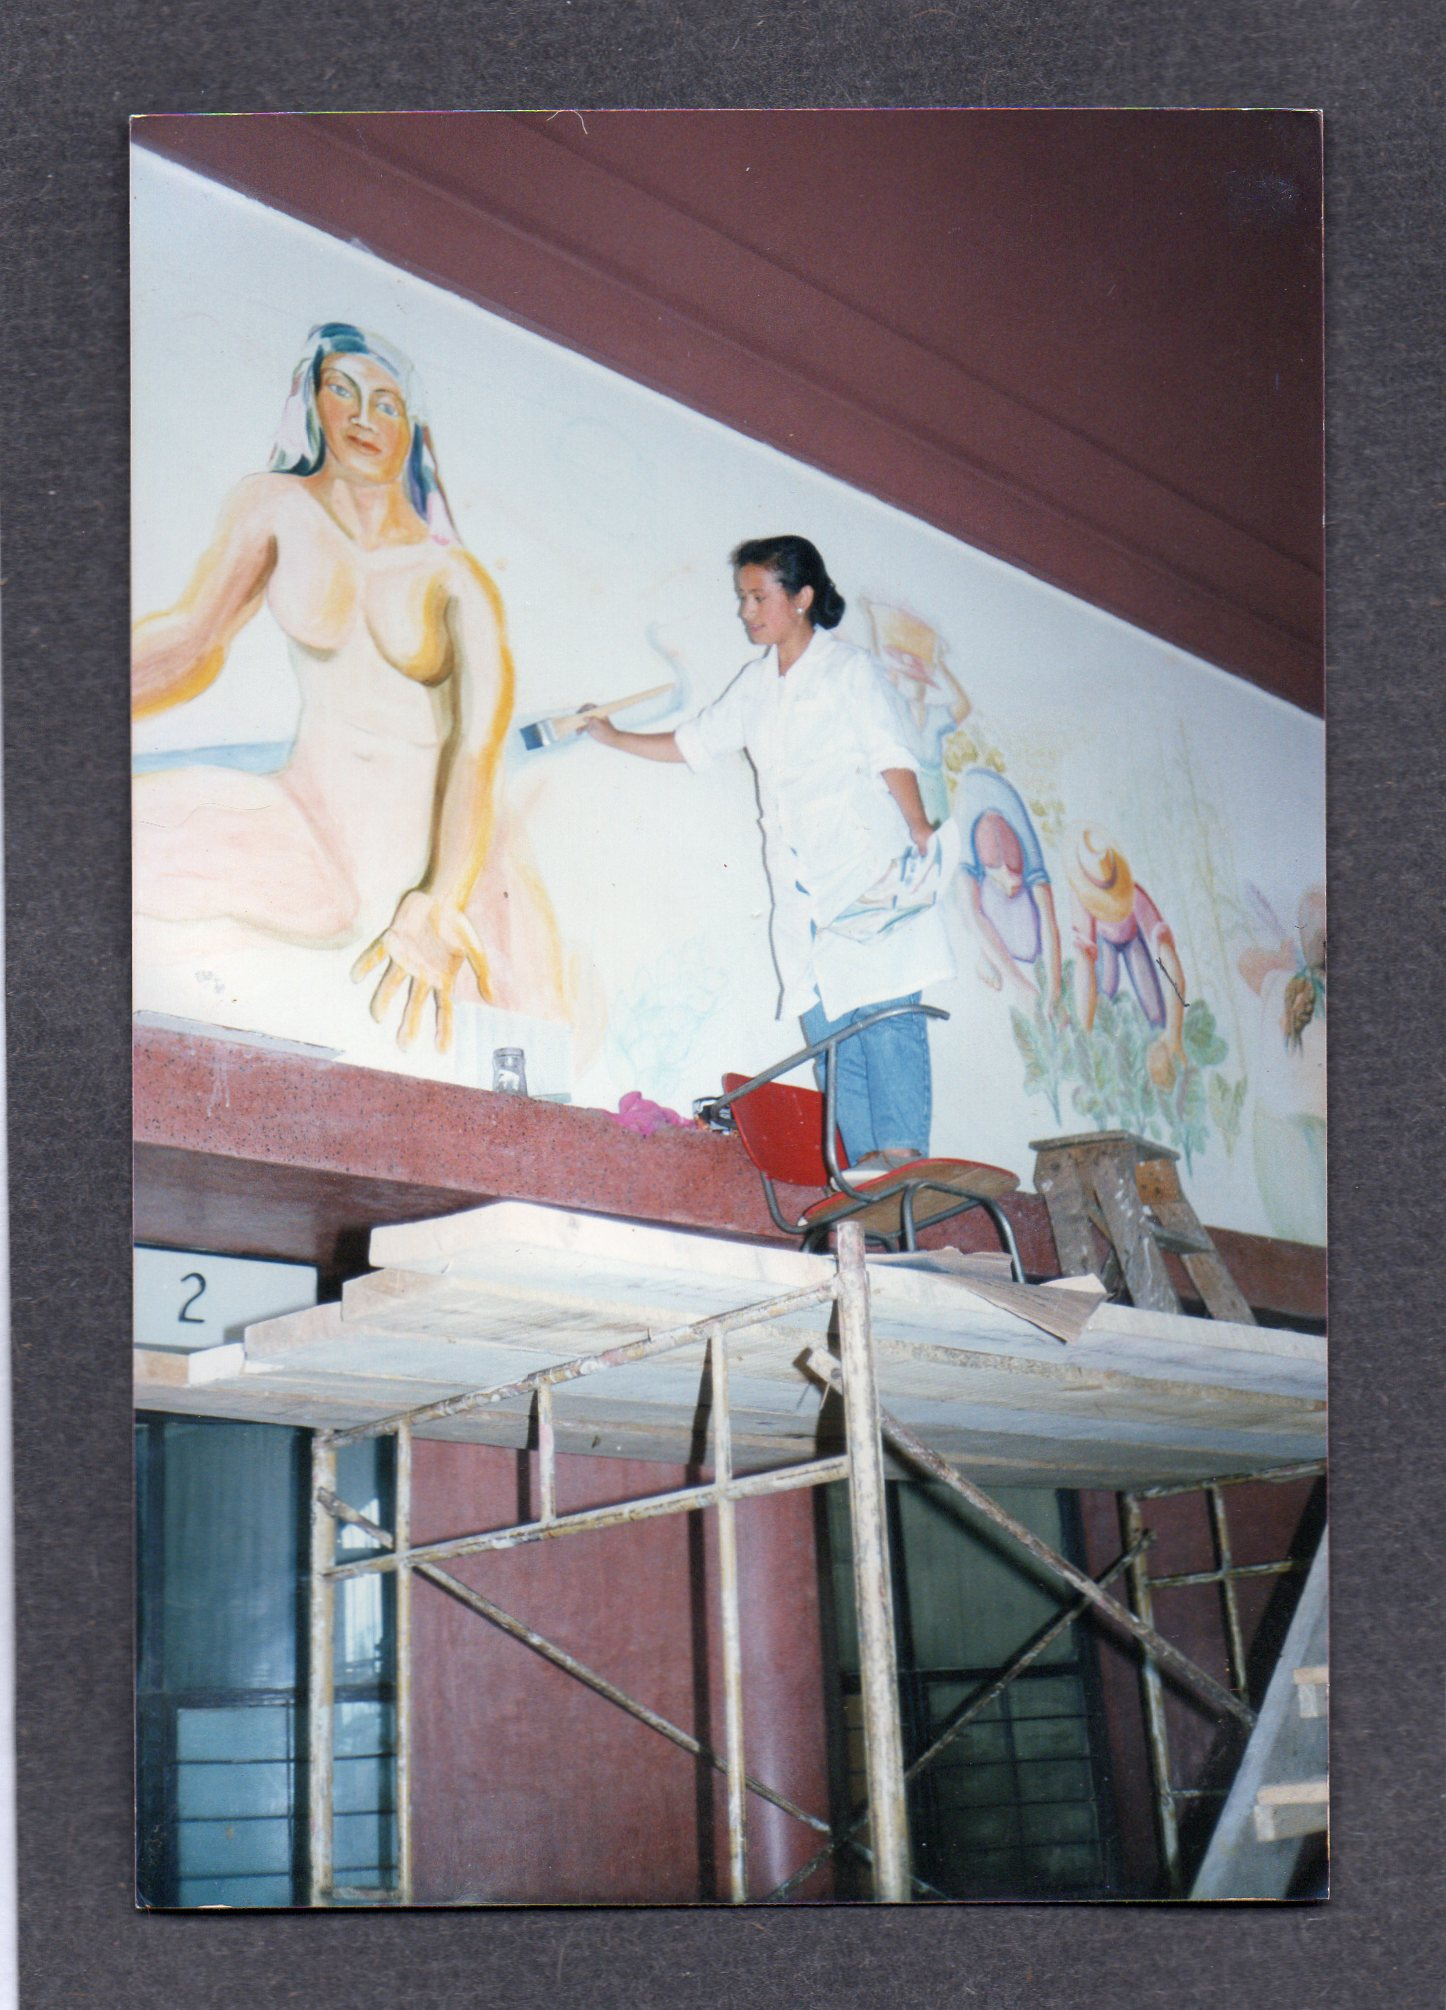 Peinture Murale (1991-1993) (2)